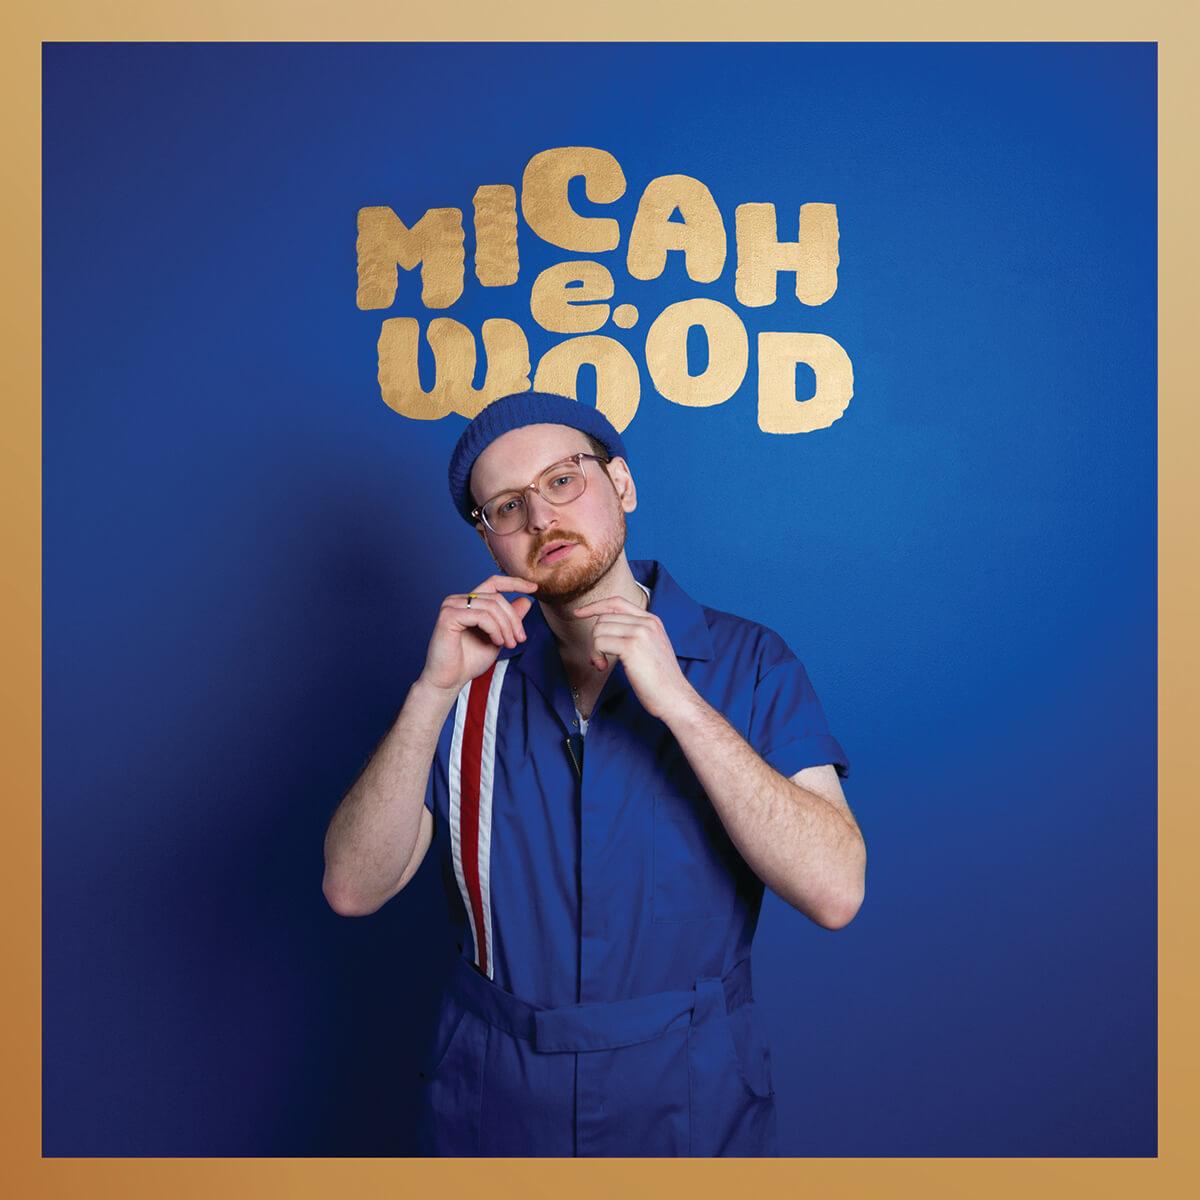 MAY-2019-MUSIC-REVIEWS-MICAH-ART.jpg#asset:116439